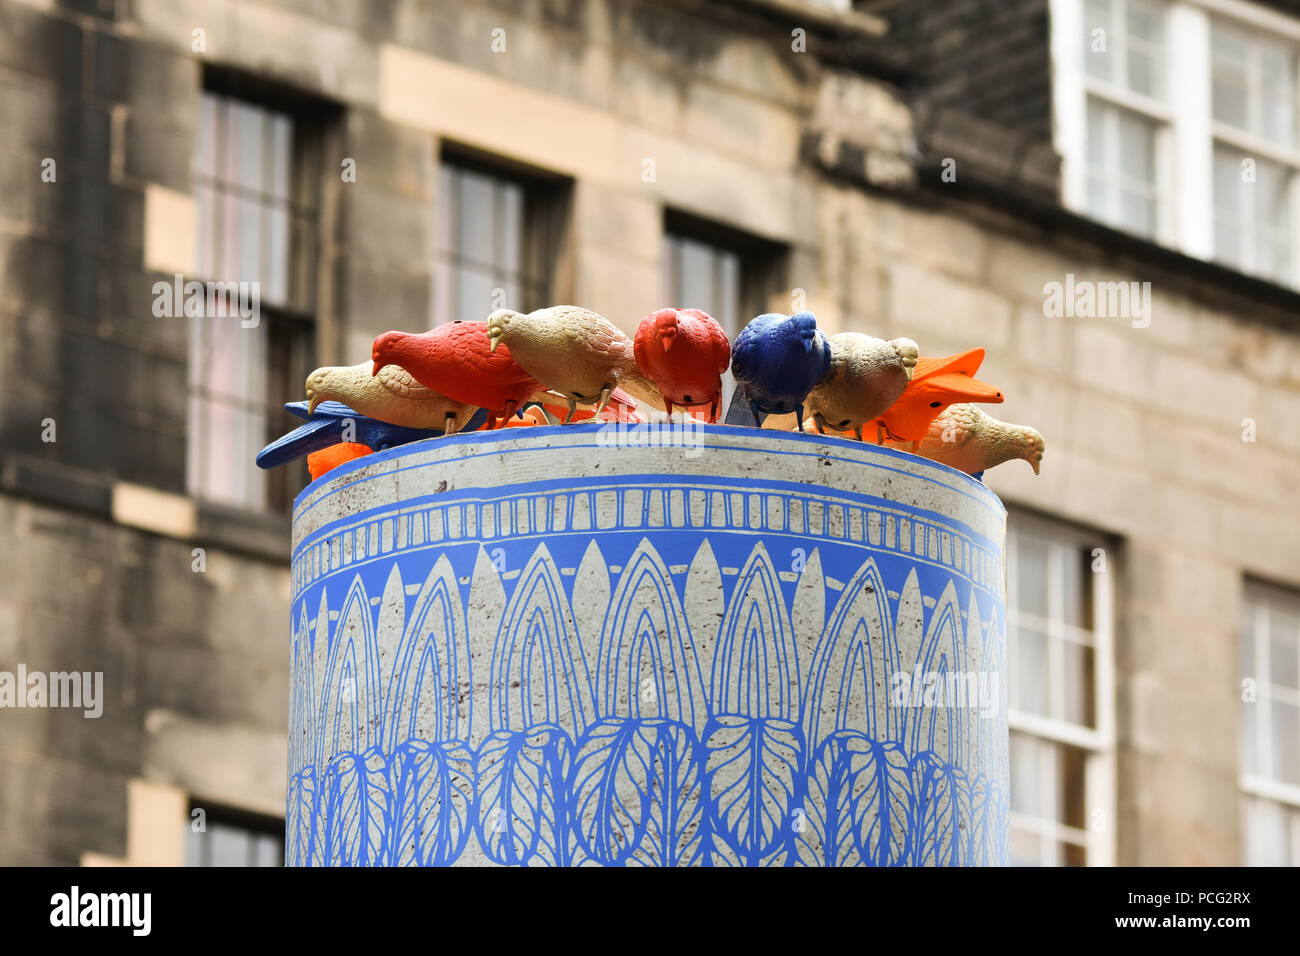 Edinburgh, UK. 2nd August, 2018, colourful plastic pigeons look on in Edinburgh's High Street at the start of the Festival Fringe season. Credit: George Philip/Alamy Live News - Stock Image